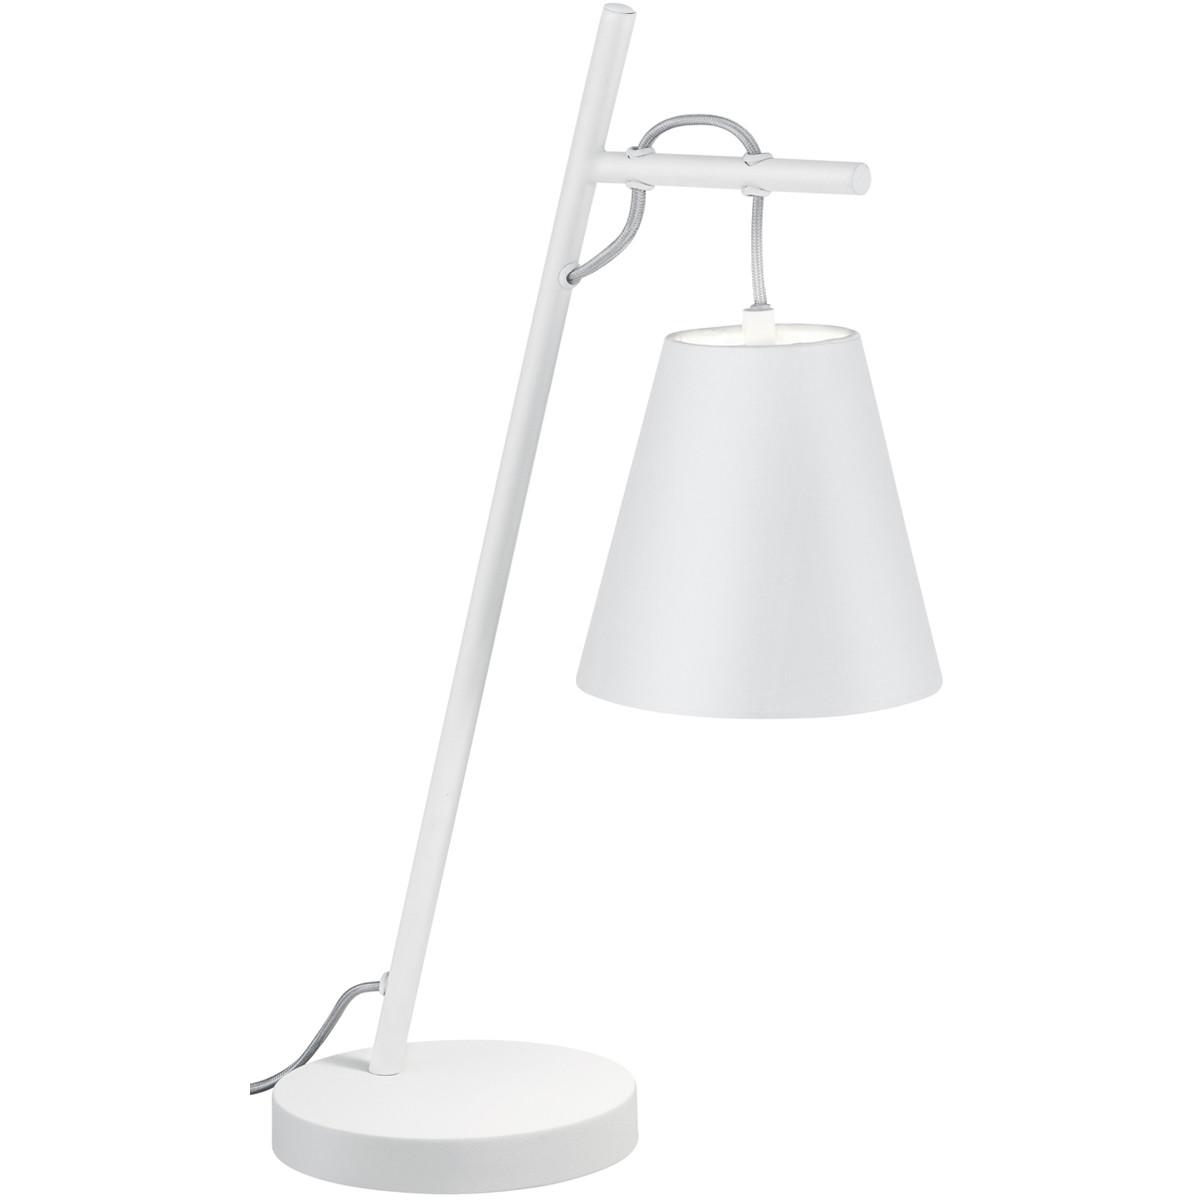 LED Tafellamp - Trion Andra - E14 Fitting - Rond - Mat Wit - Aluminium